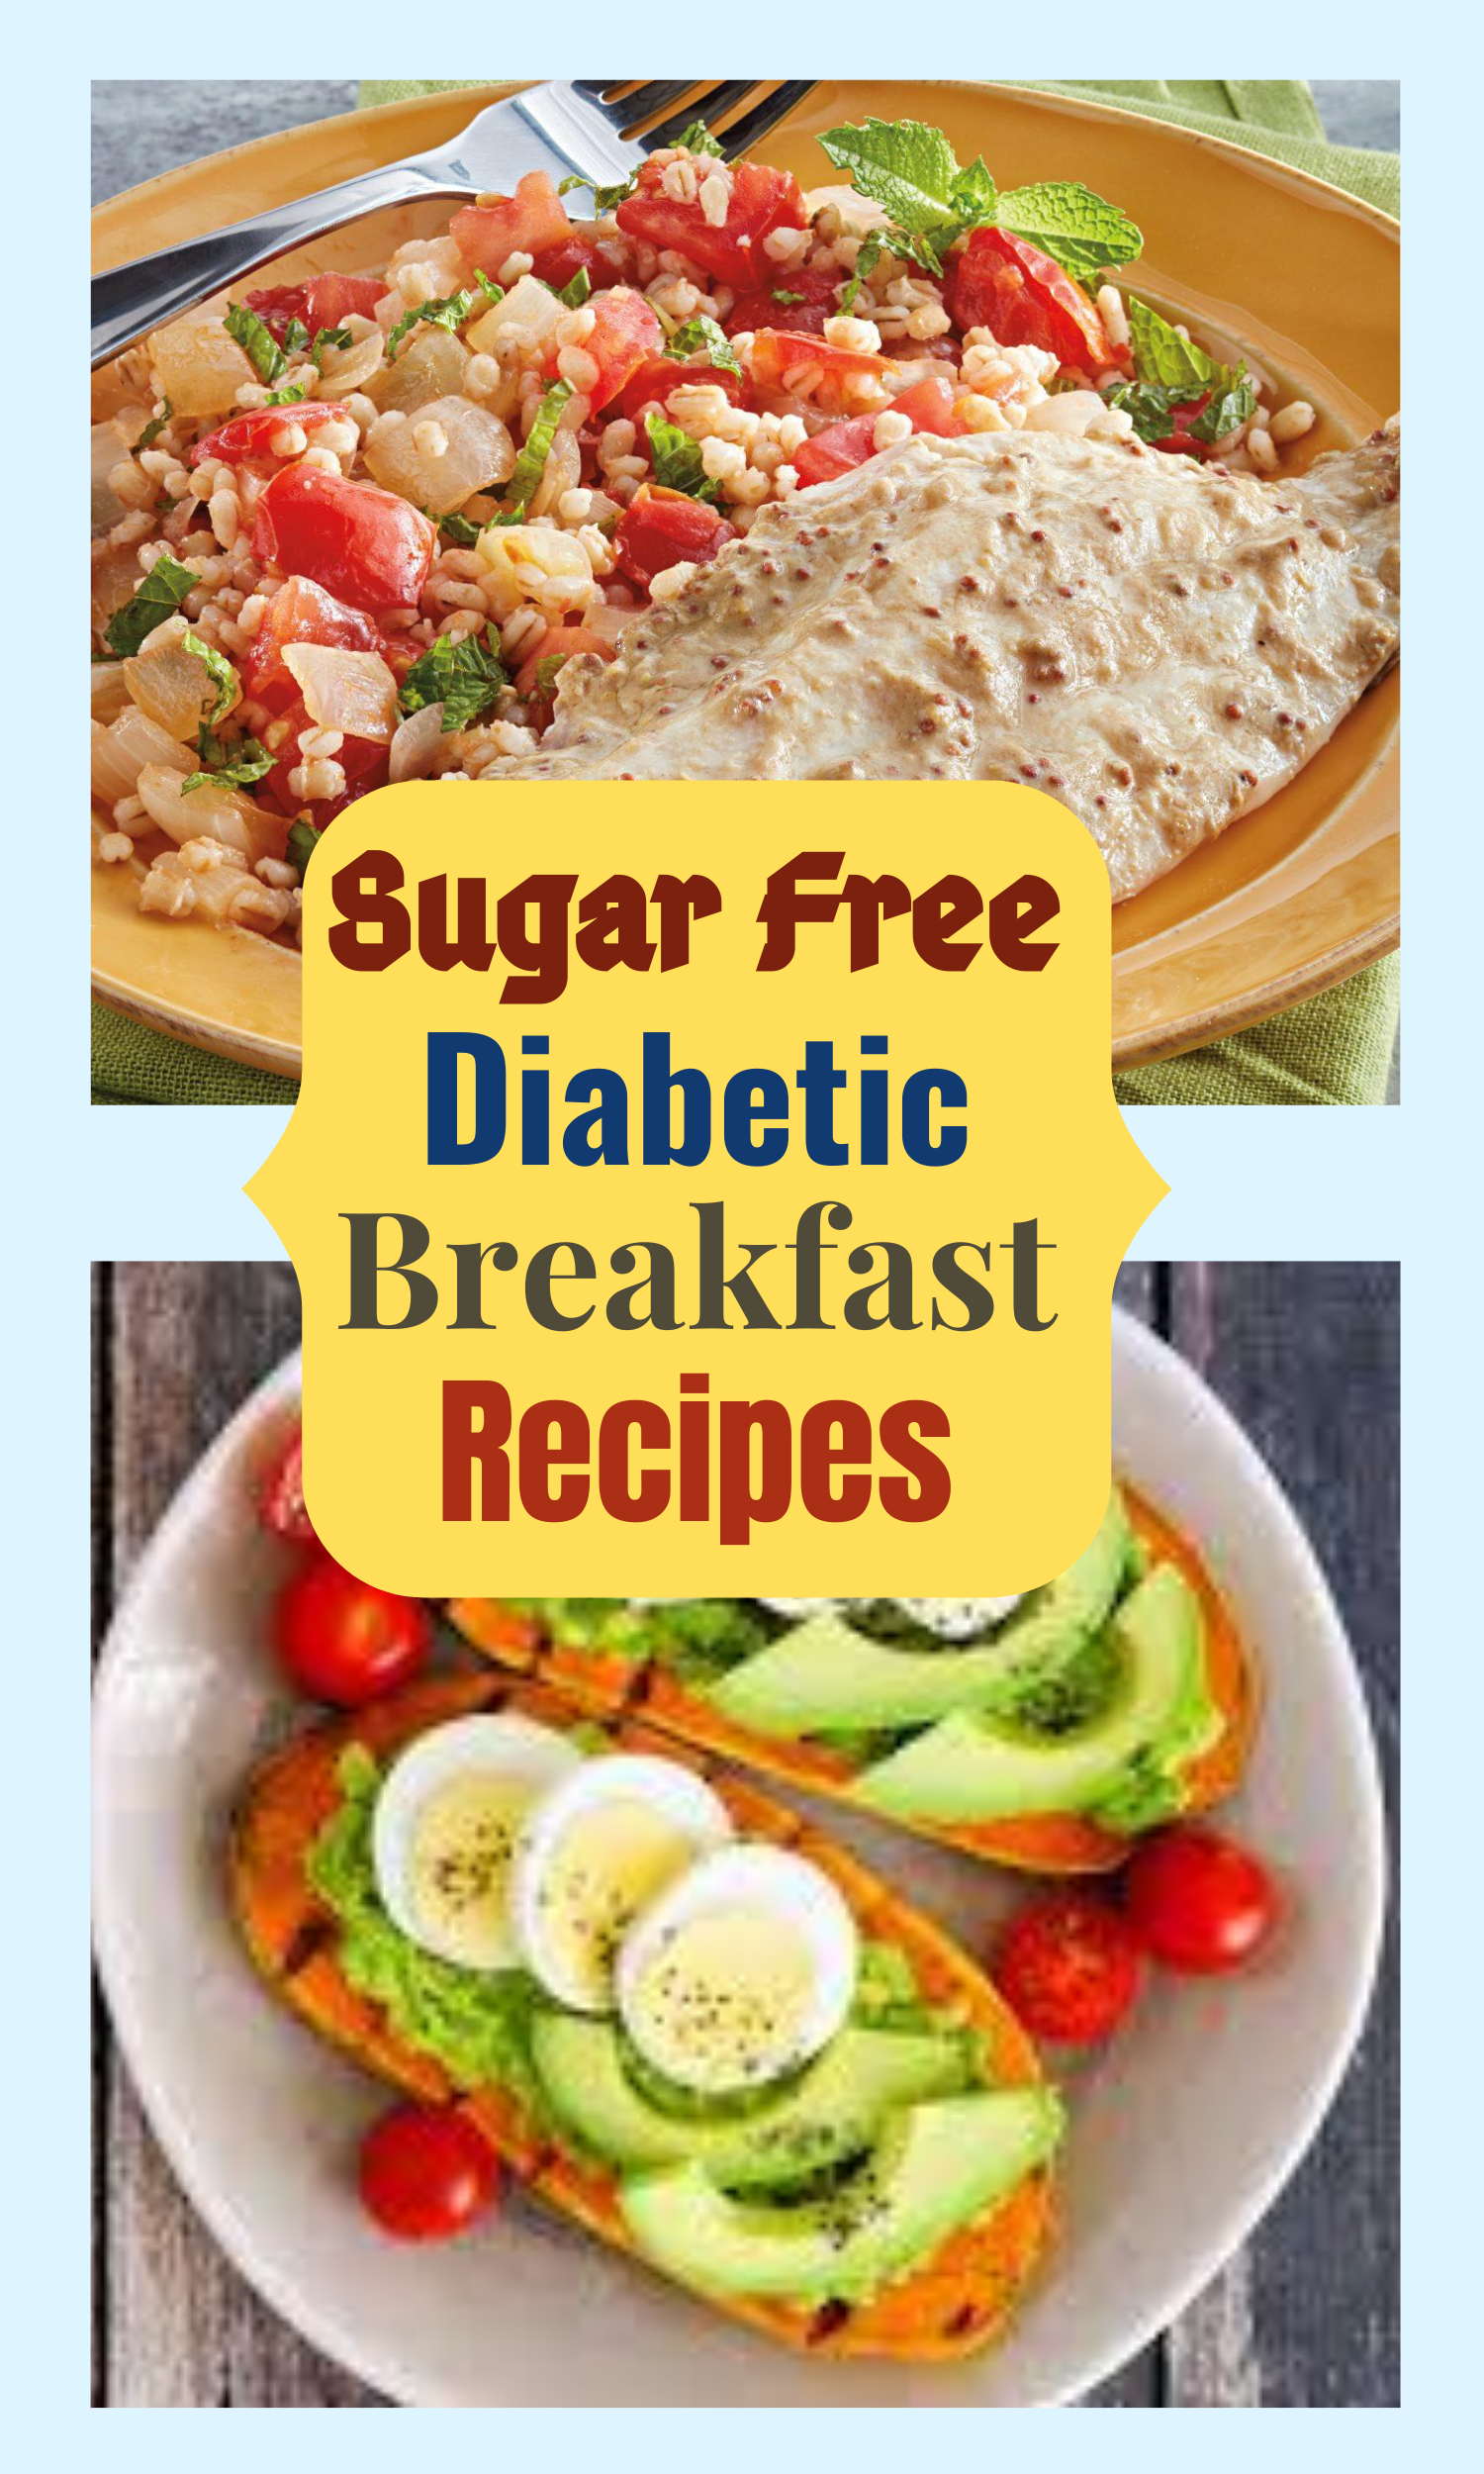 Sugar Free Diabetic Breakfast Recipes Diabetic Breakfast Recipes Diabetic Breakfast Breakfast Recipes